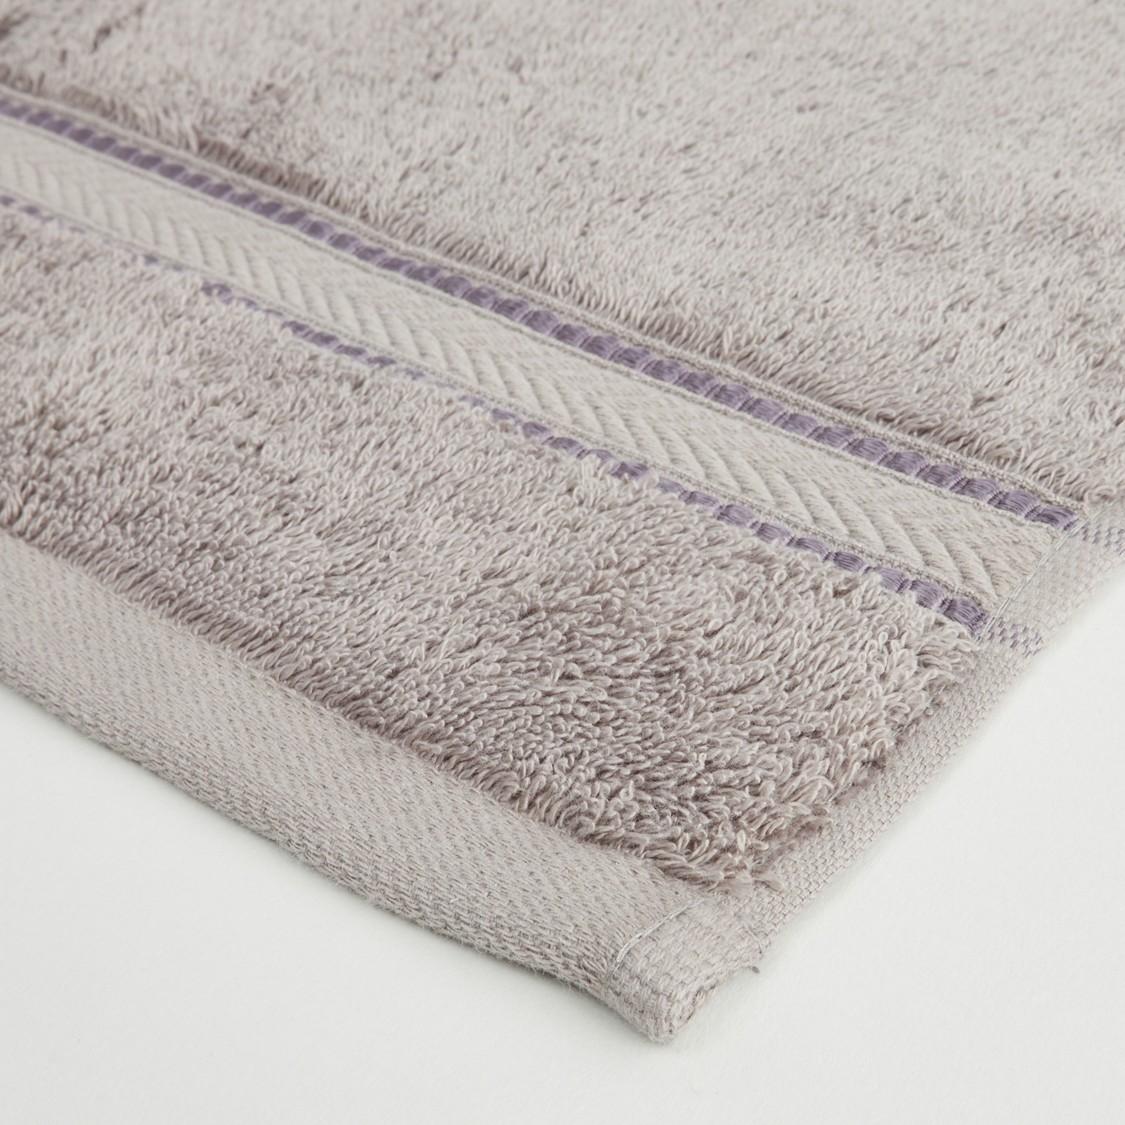 4-Piece Textured Egyptian Cotton Face Towel Set - 30x30 cms